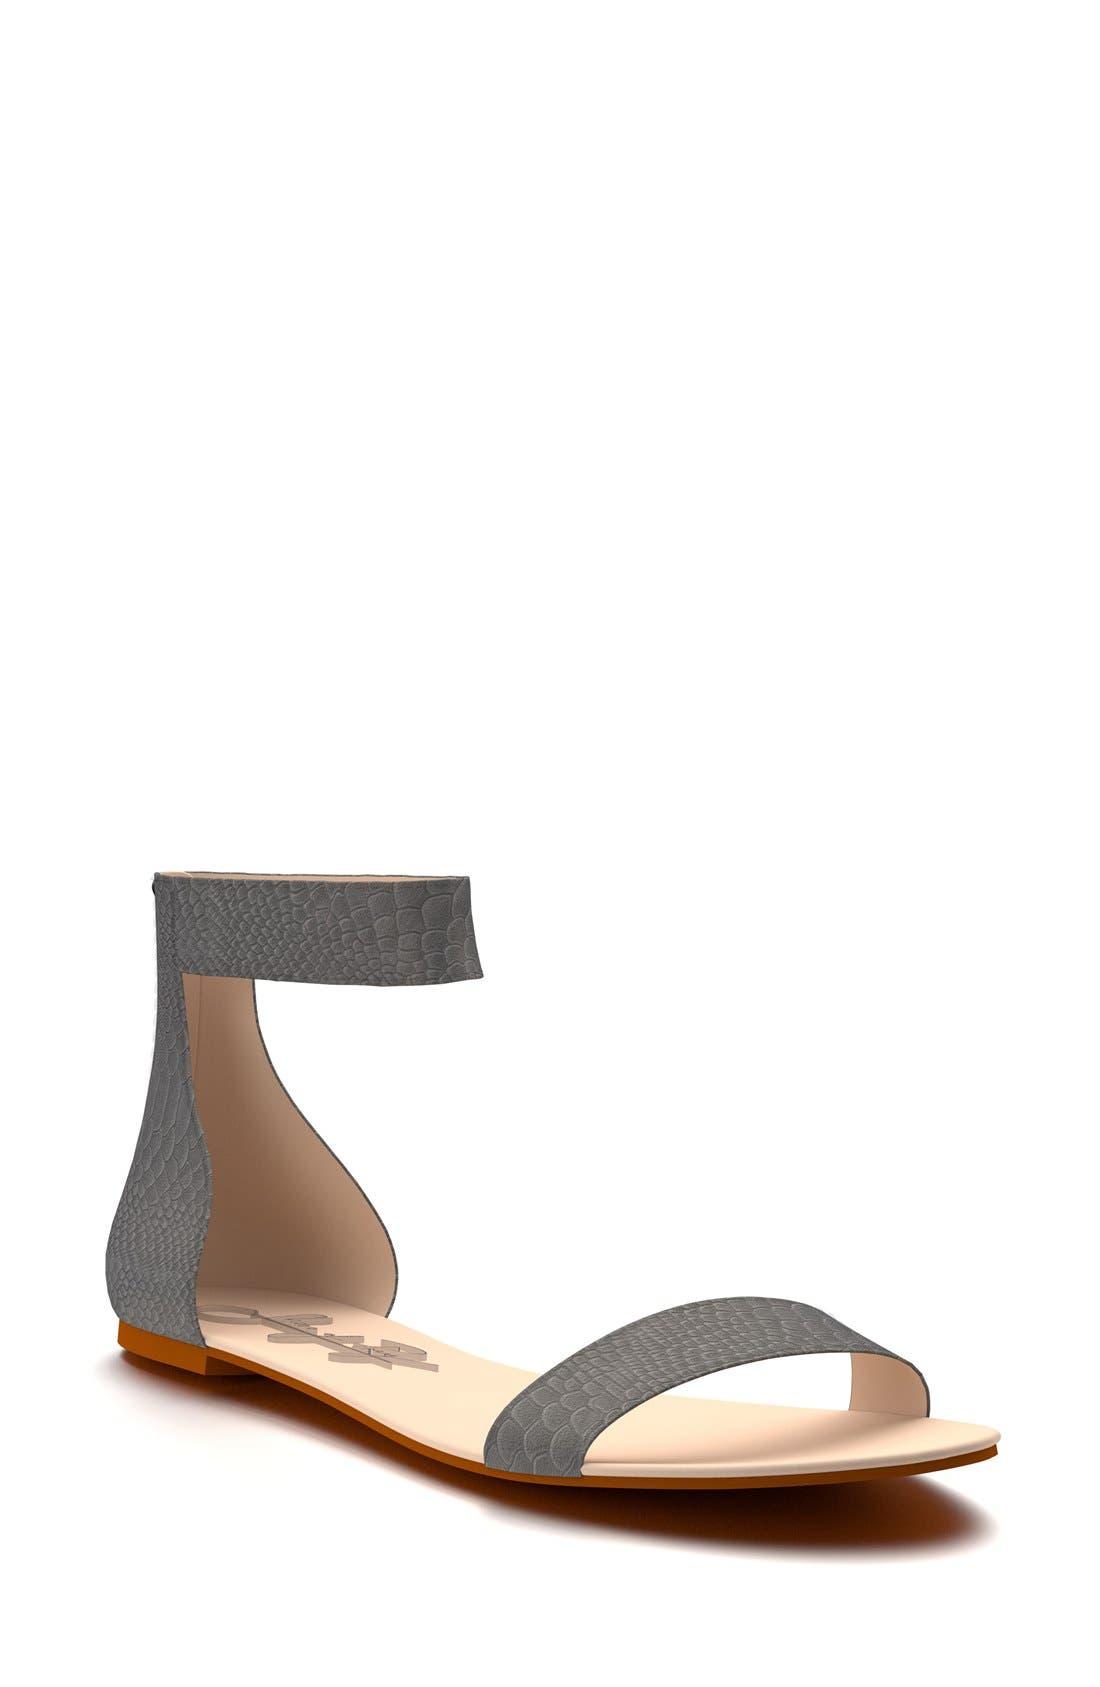 Main Image - Shoes of Prey Ankle Strap Sandal (Women)